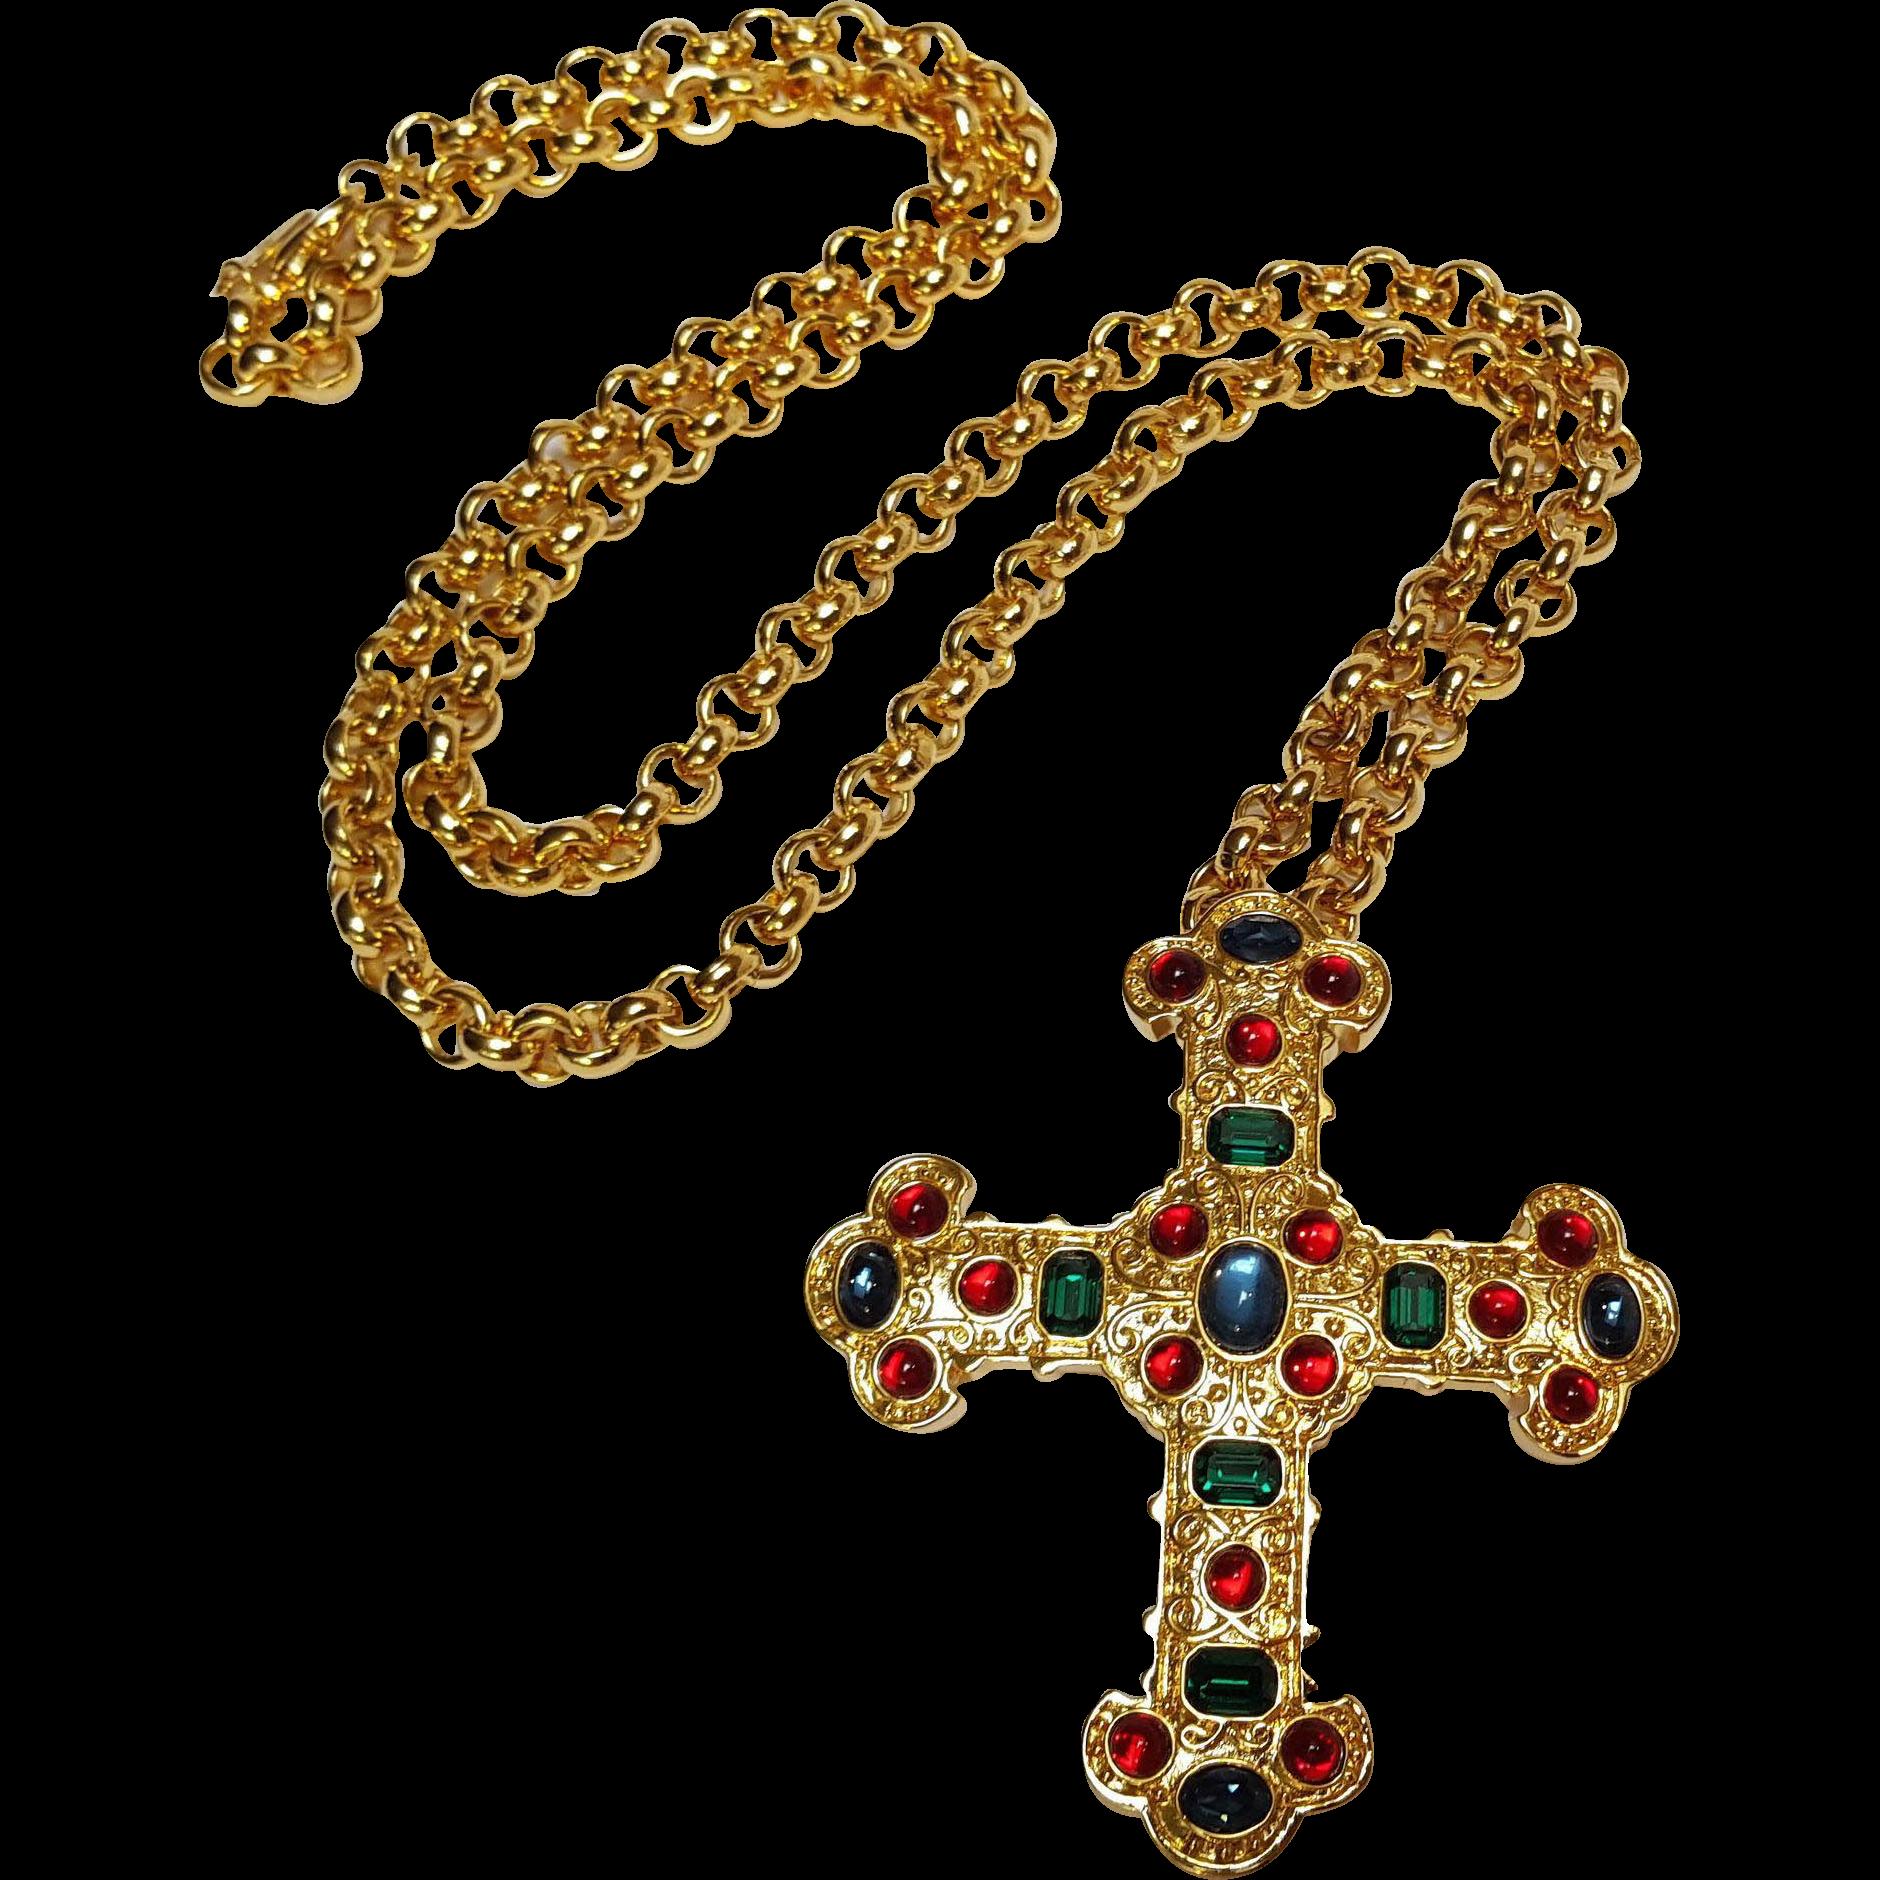 Michaela Von Hobsburg cross pendant necklace